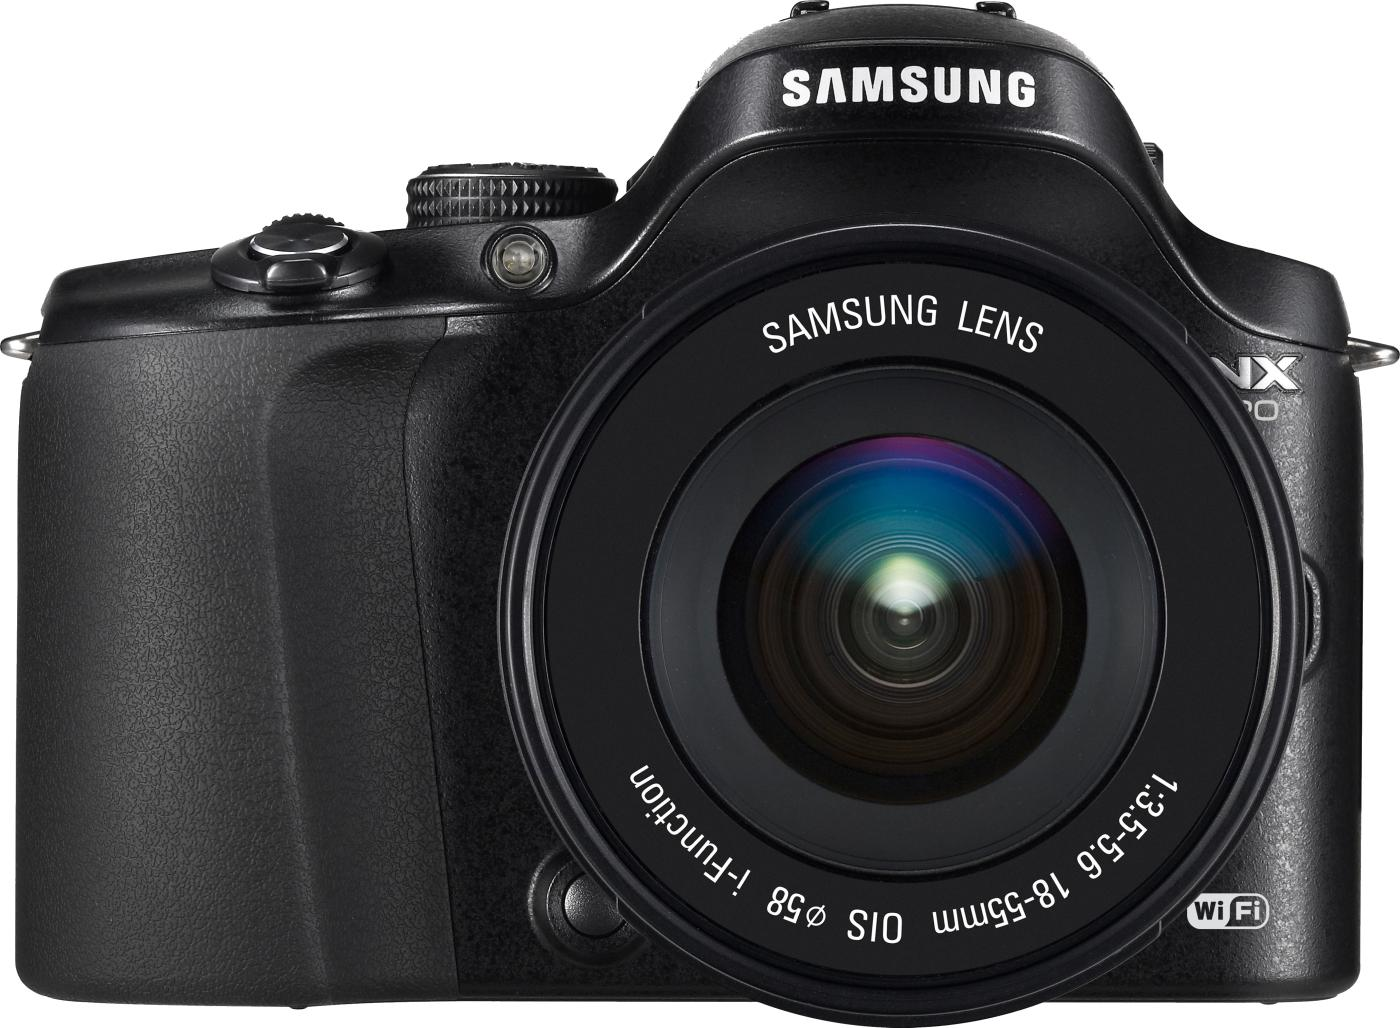 Samsung NX20 + Samsung 18-55mm f/3.5-5.6 OIS iFunction